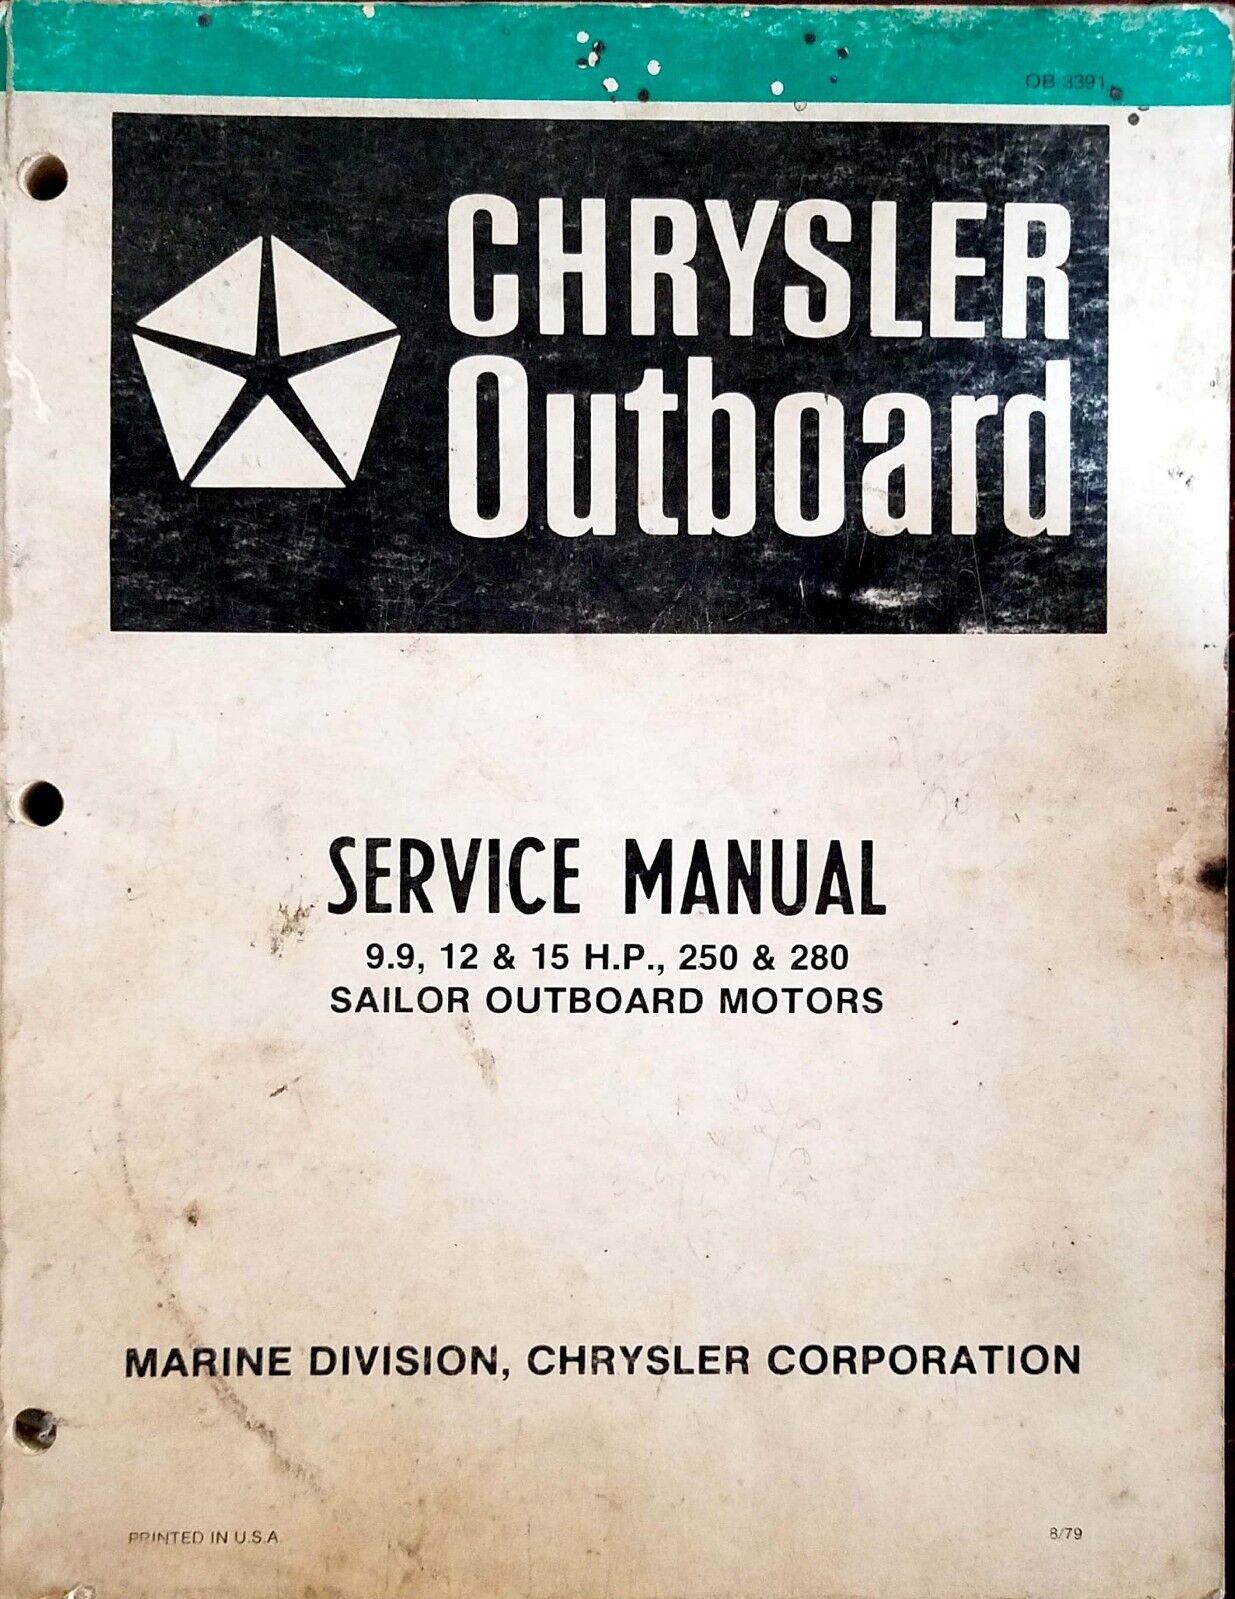 Chrysler Outboard Service Manual for 9.9HP 12HP 15HP 250 Sailor 280 Sailor